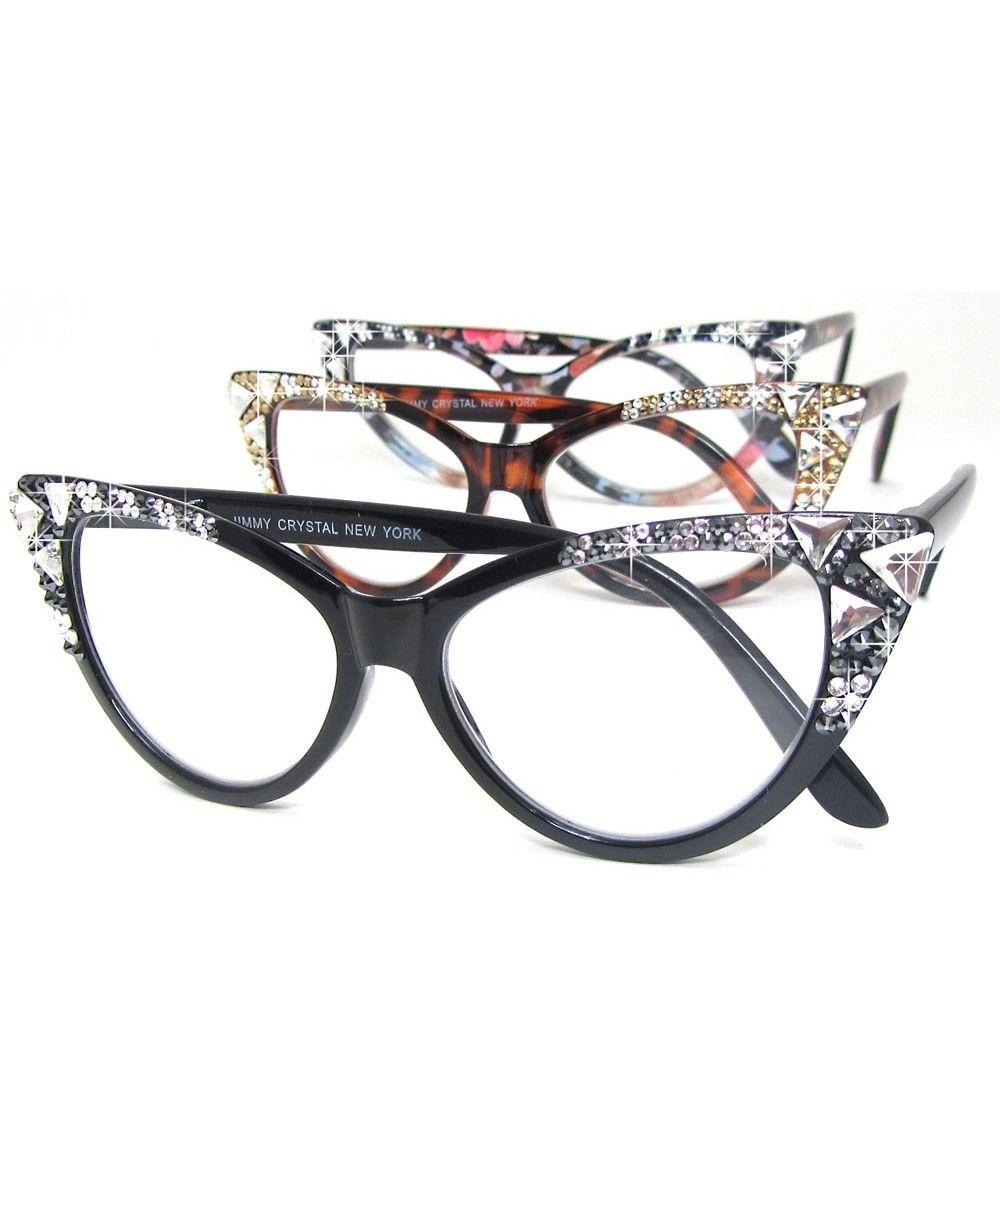 9006b4287a GORGEOUS new Jimmy Crystal brand cat eye reading glasses. Oh. My. GOSH.   JimmyCrystal  fashionOver40  fashionOver50  designerReadingGlasses ...